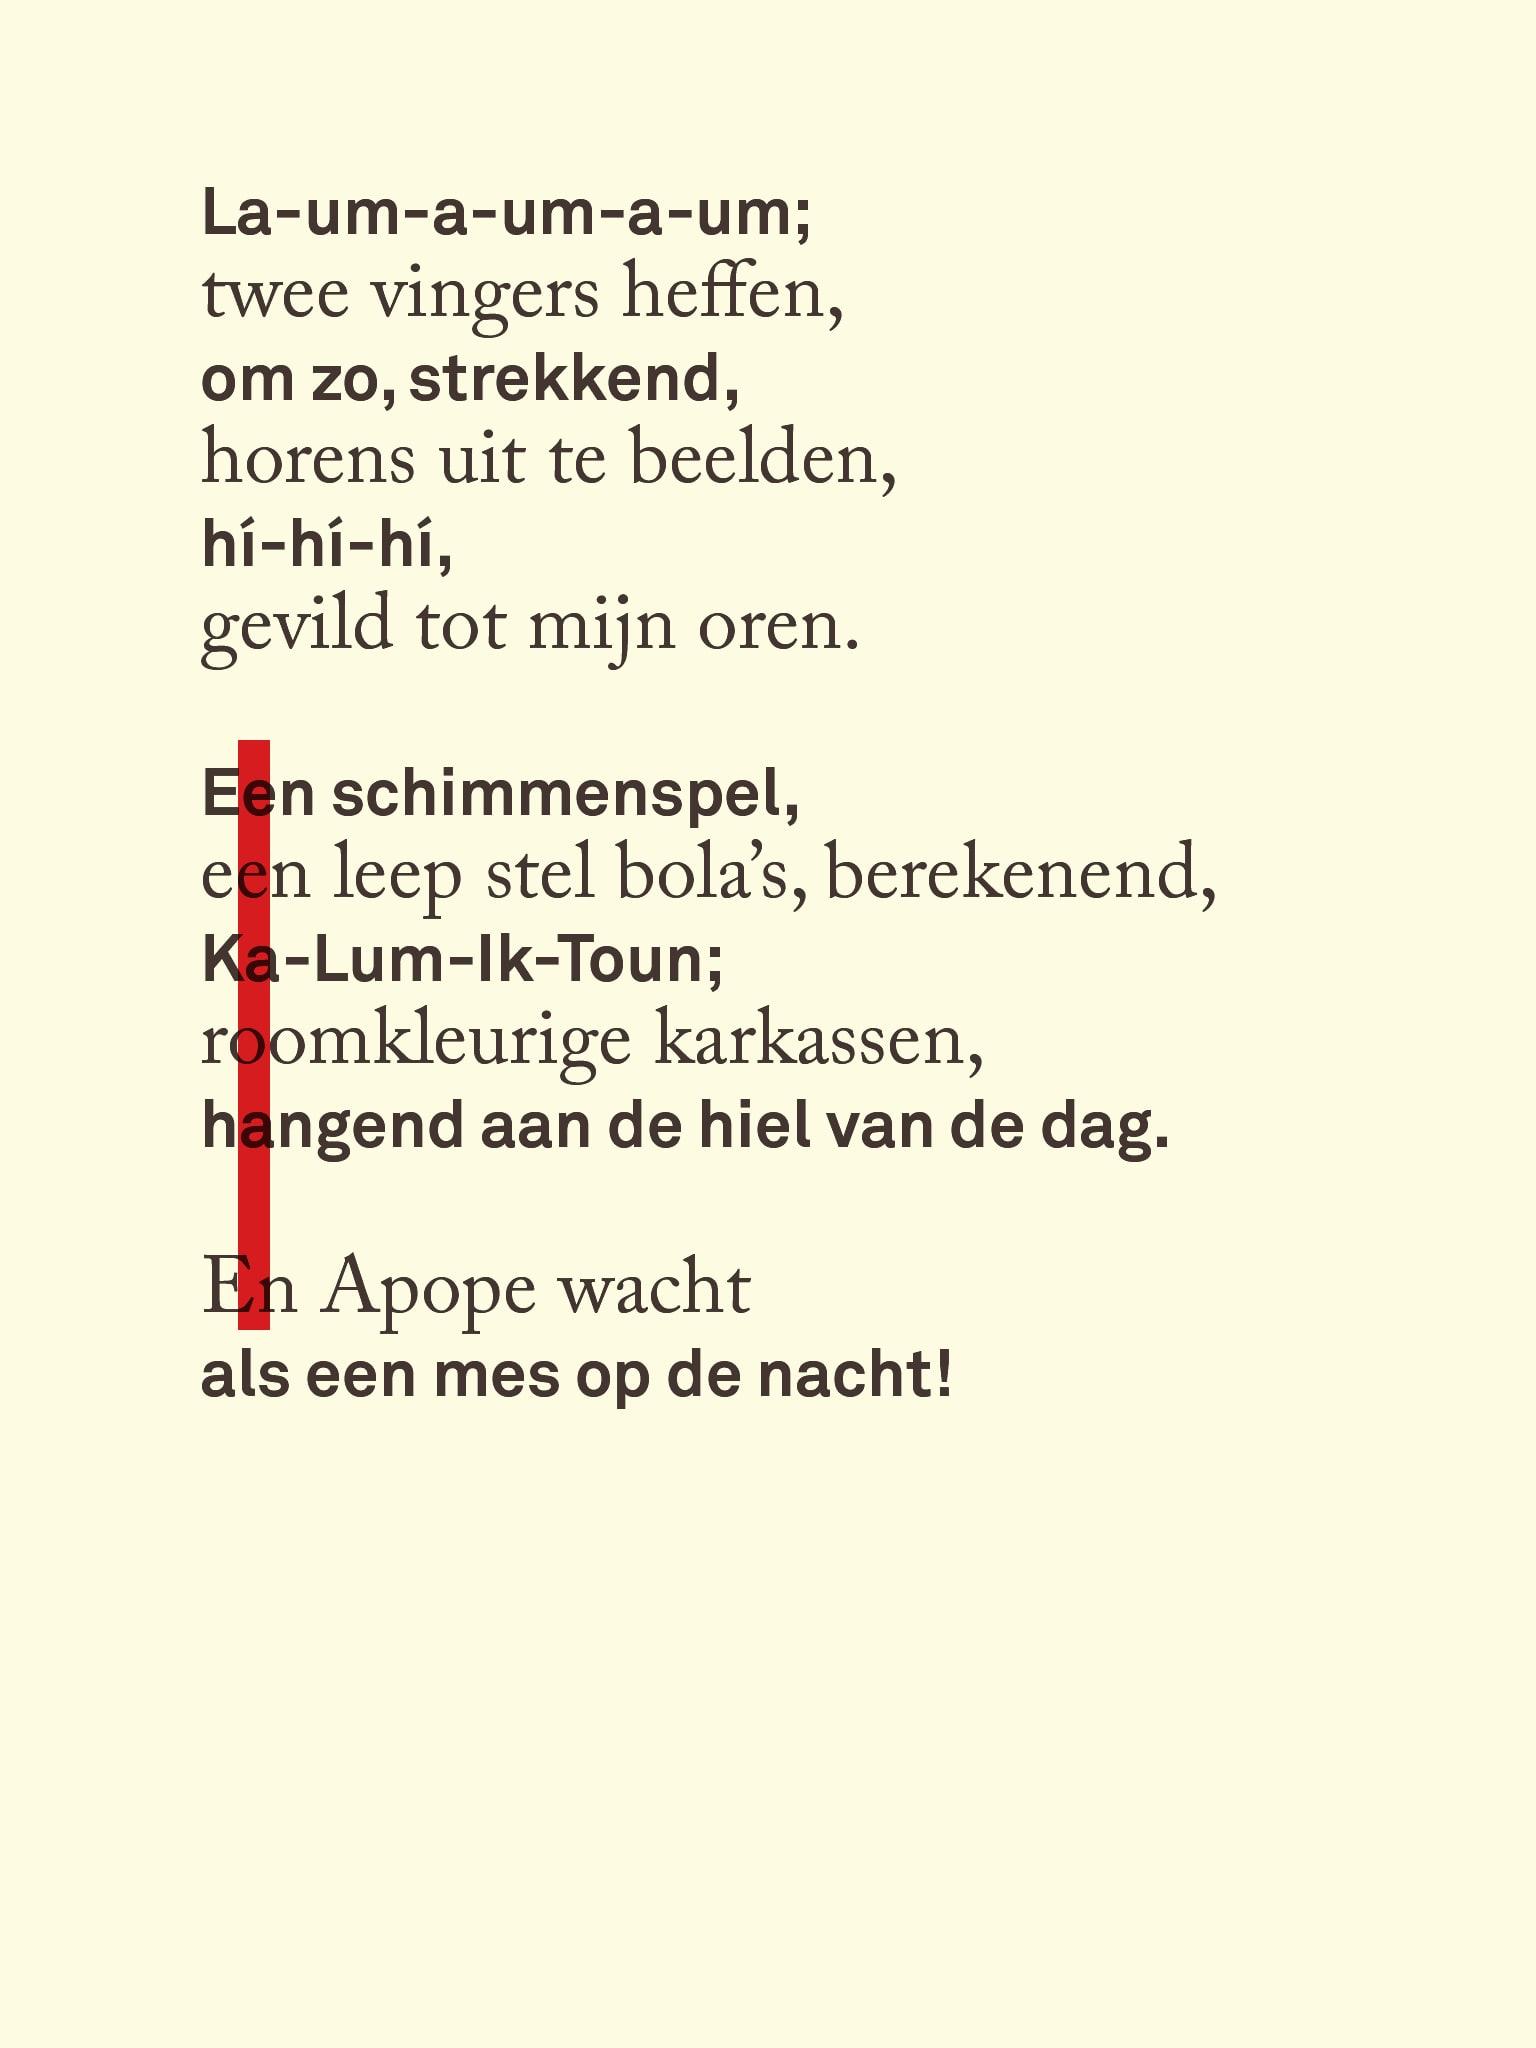 Theodorus Marinus van den Berg / Michael J / 2013